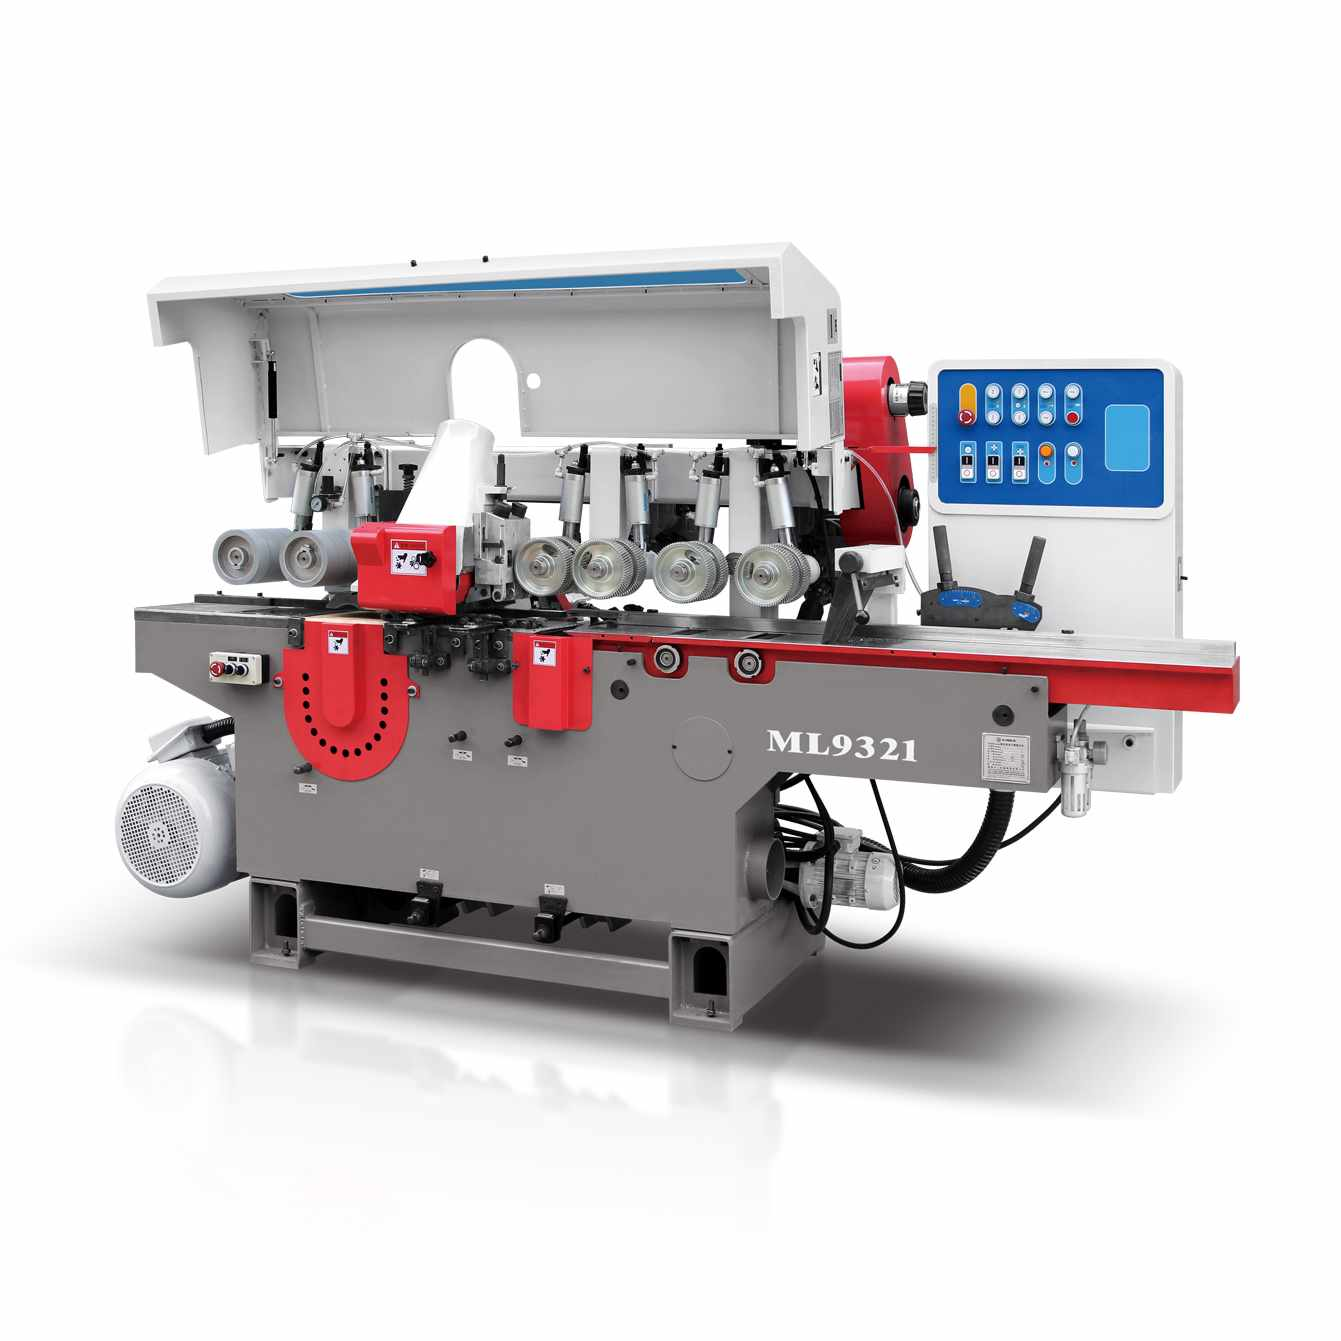 Rip Saw Machine Factory - VH-ML9321 / VH-ML9321A Single/Multi Rip Saw